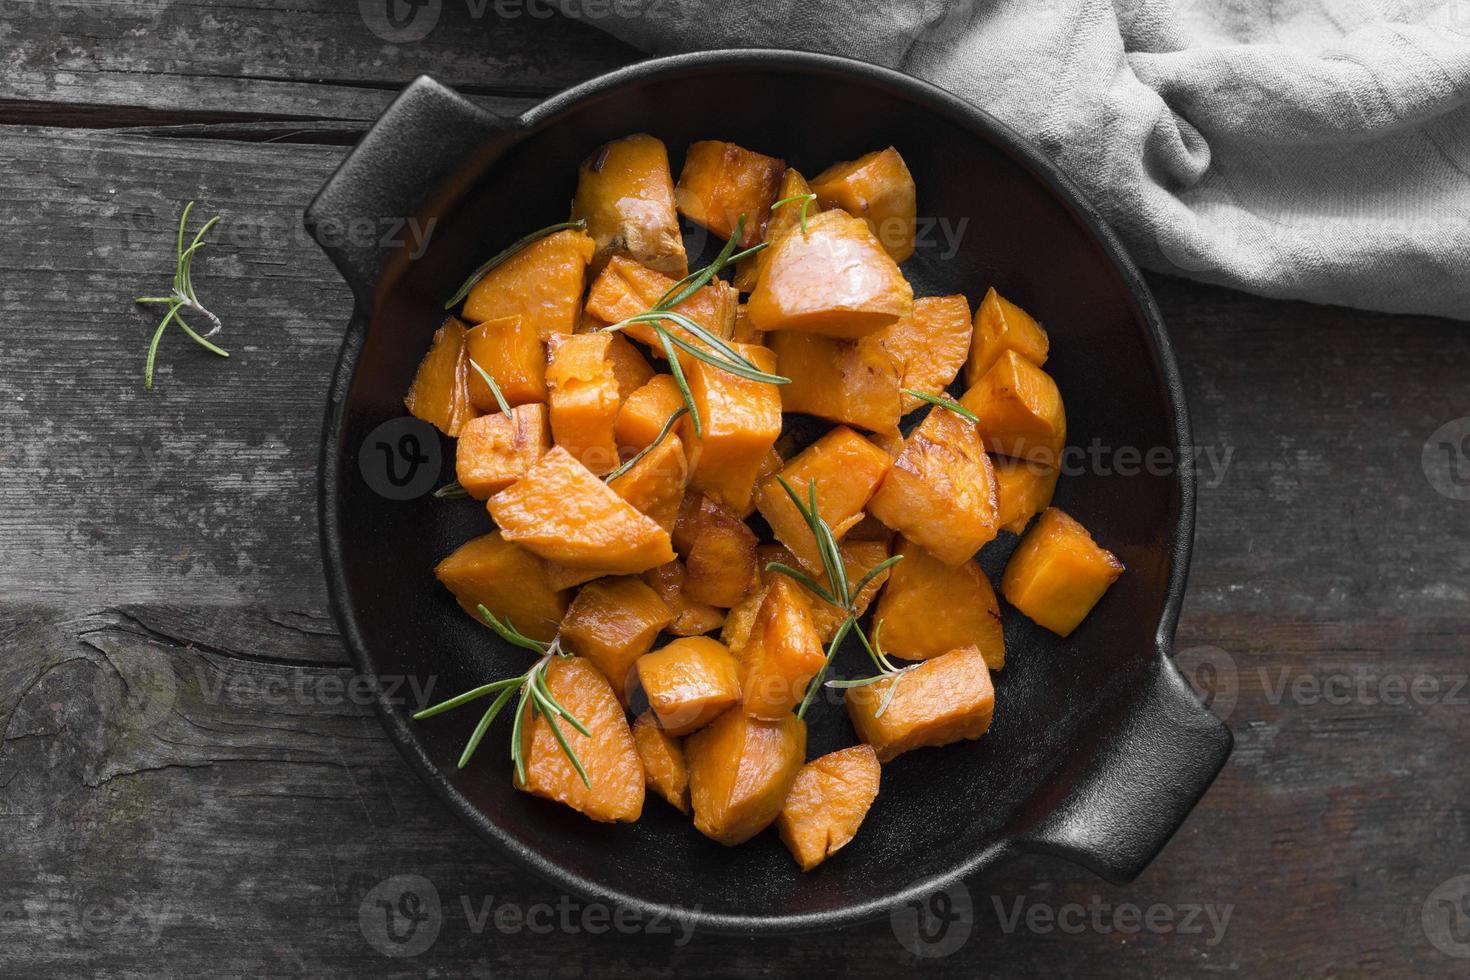 Süßkartoffel-Essen foto